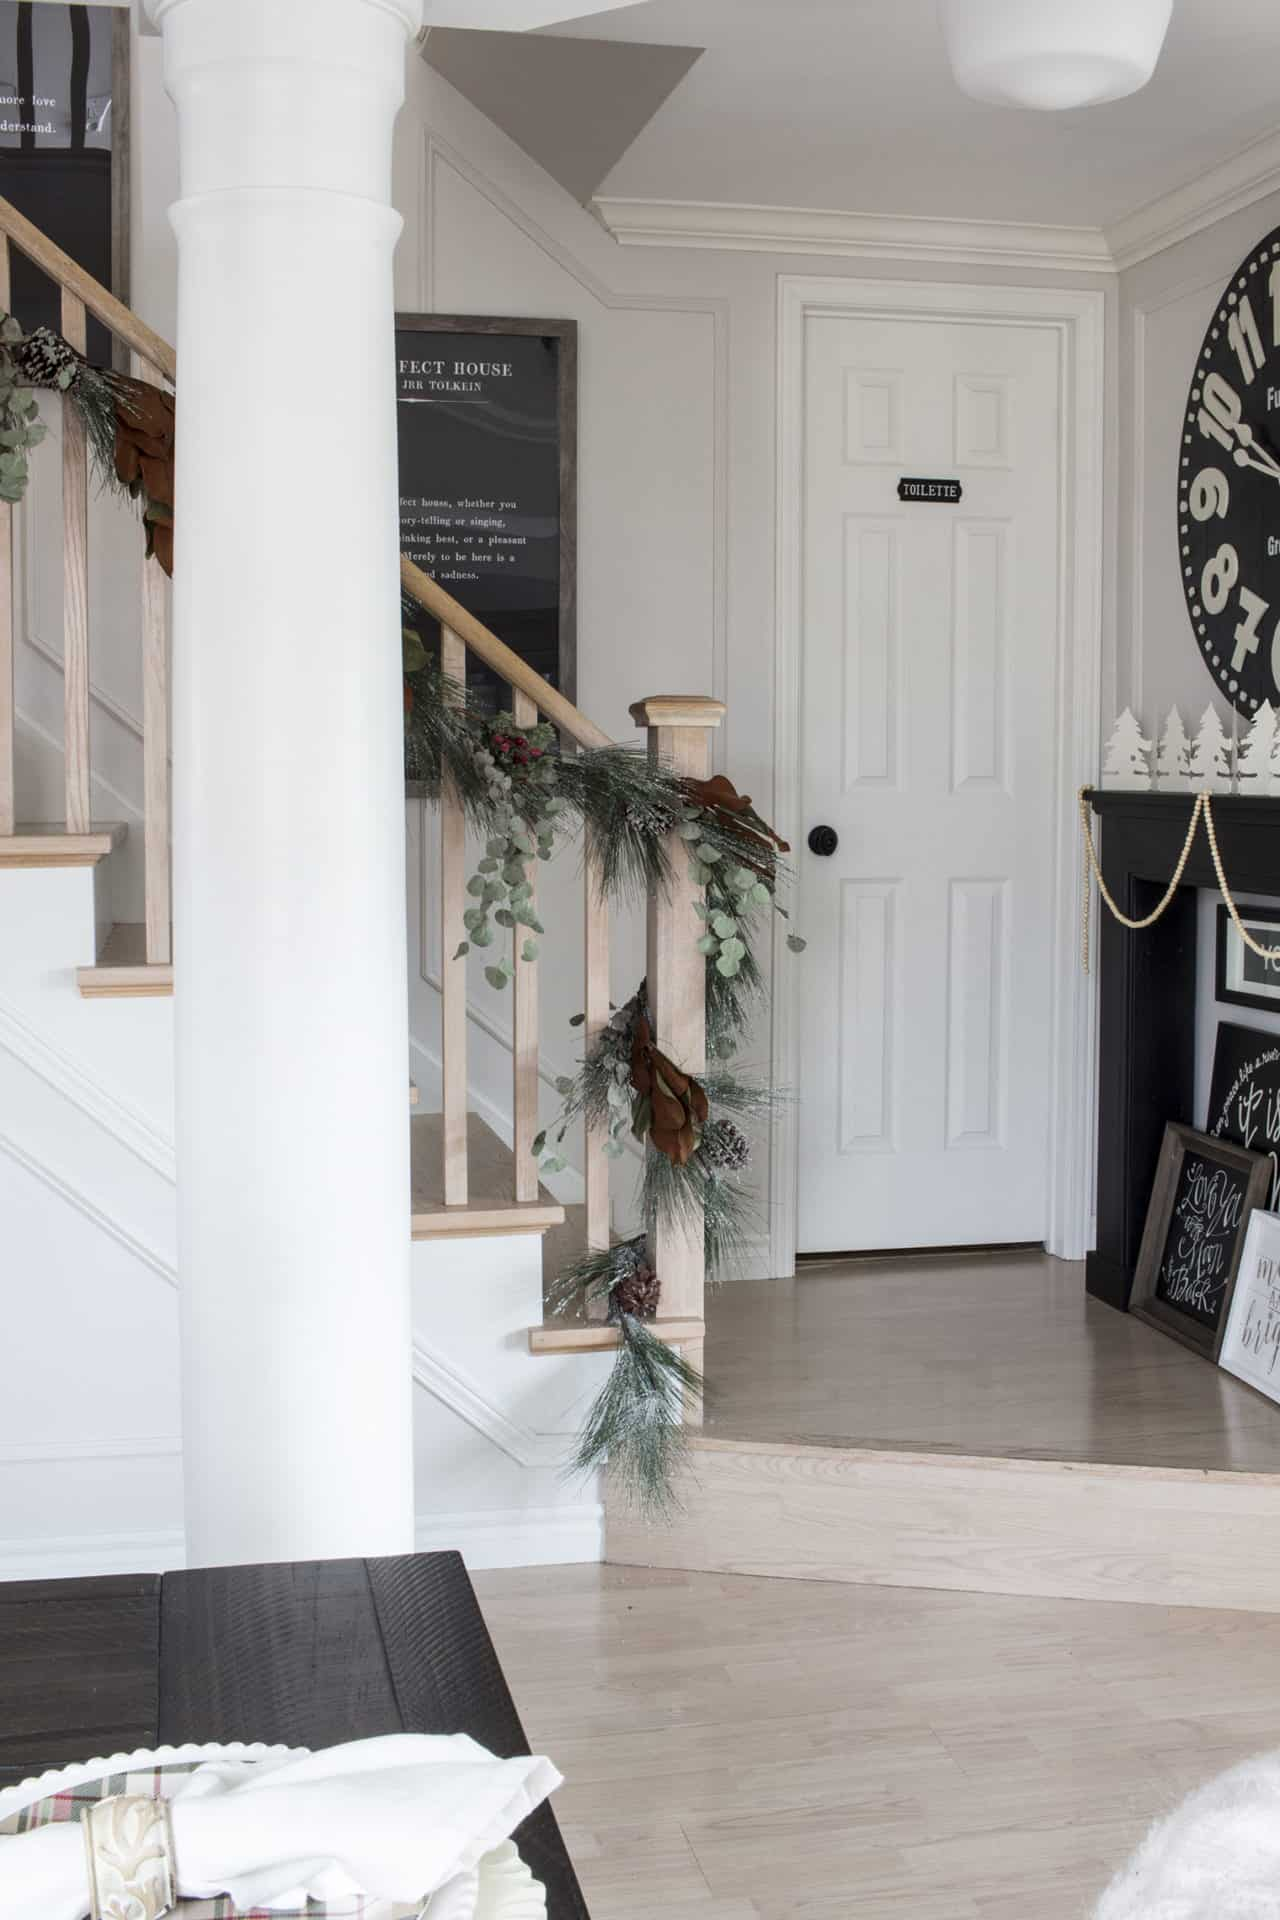 landing and bathroom door for Christmas